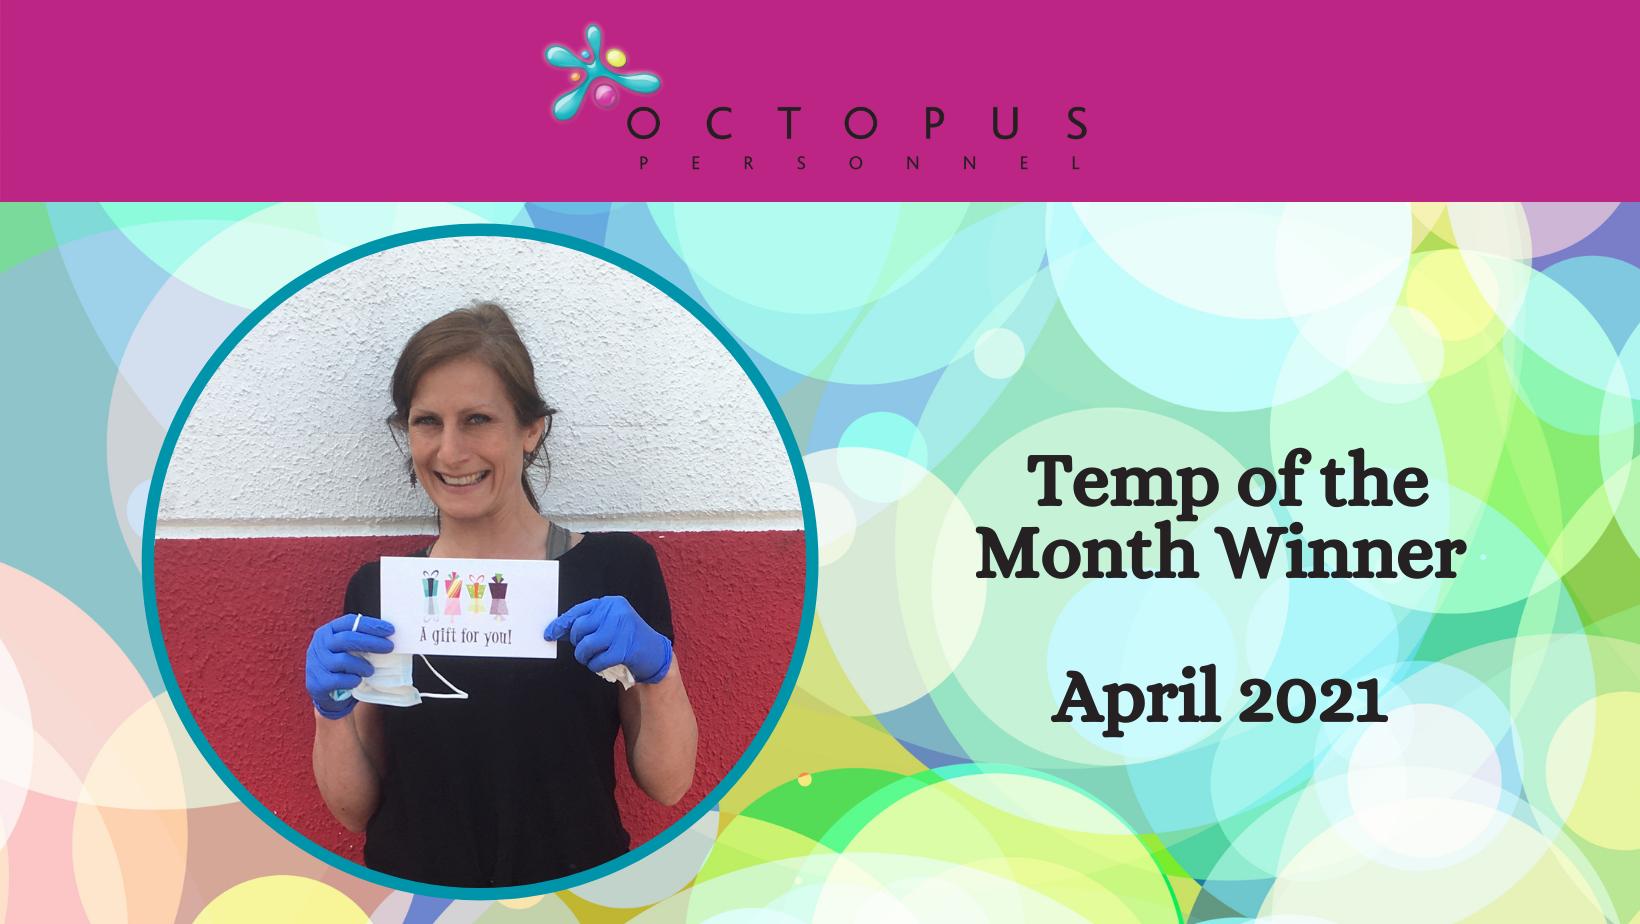 Temp of the Month Winner